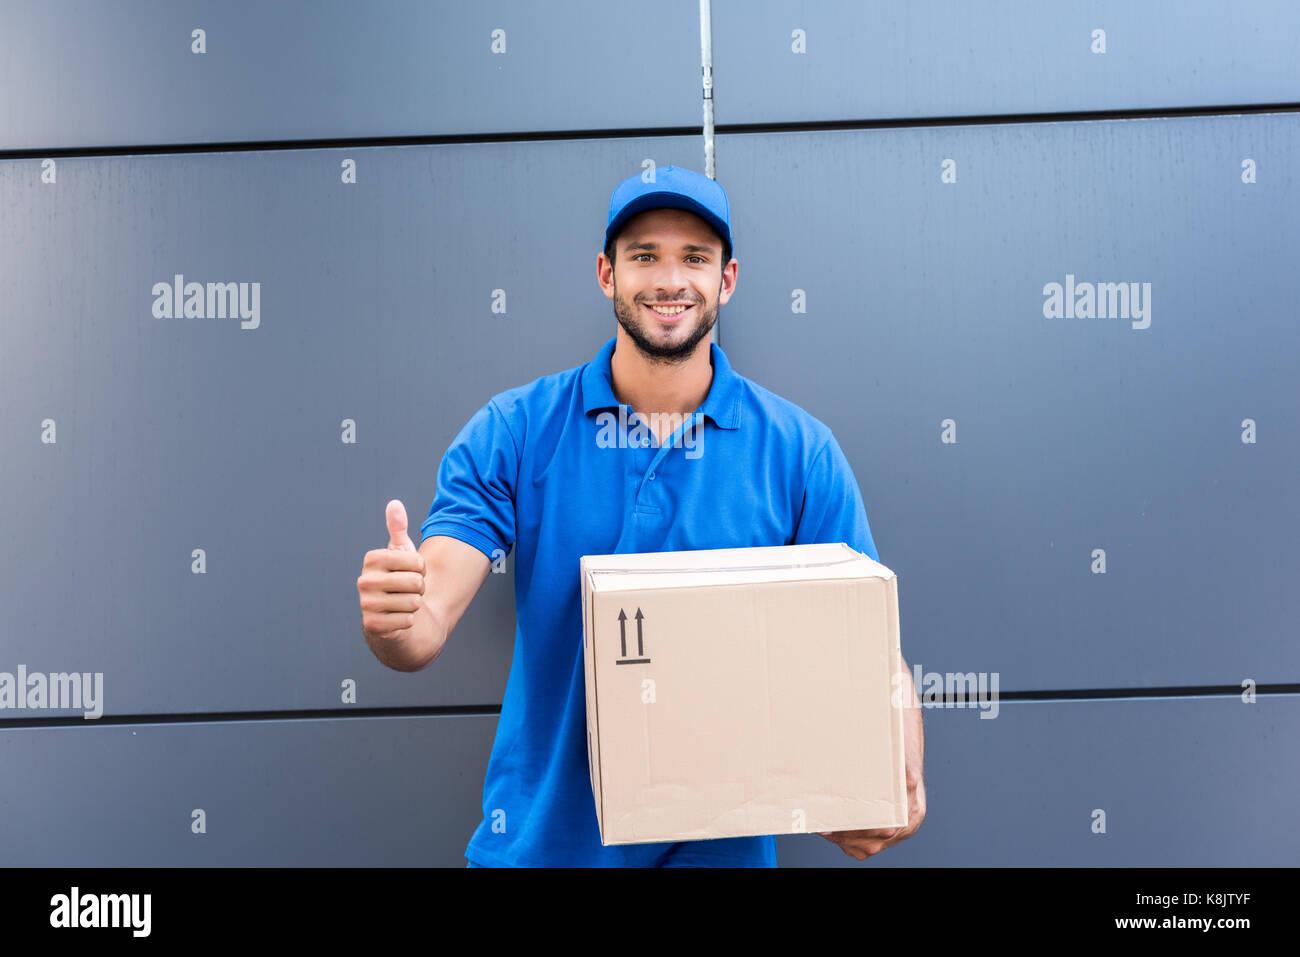 Hombre de entrega mostrando pulgar arriba Imagen De Stock